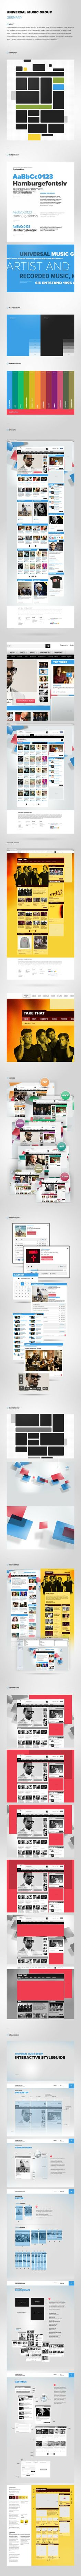 Interaction Design / Universal Music Group Germany by Rene Bieder, via Behance *** Relaunch of the Universal Music Group Germany Website - styleguide presentation? Mobile Web Design, Web Ui Design, Branding Design, Ui Kit, Intranet Design, Design Responsive, Digital Web, Ui Design Inspiration, Web Layout